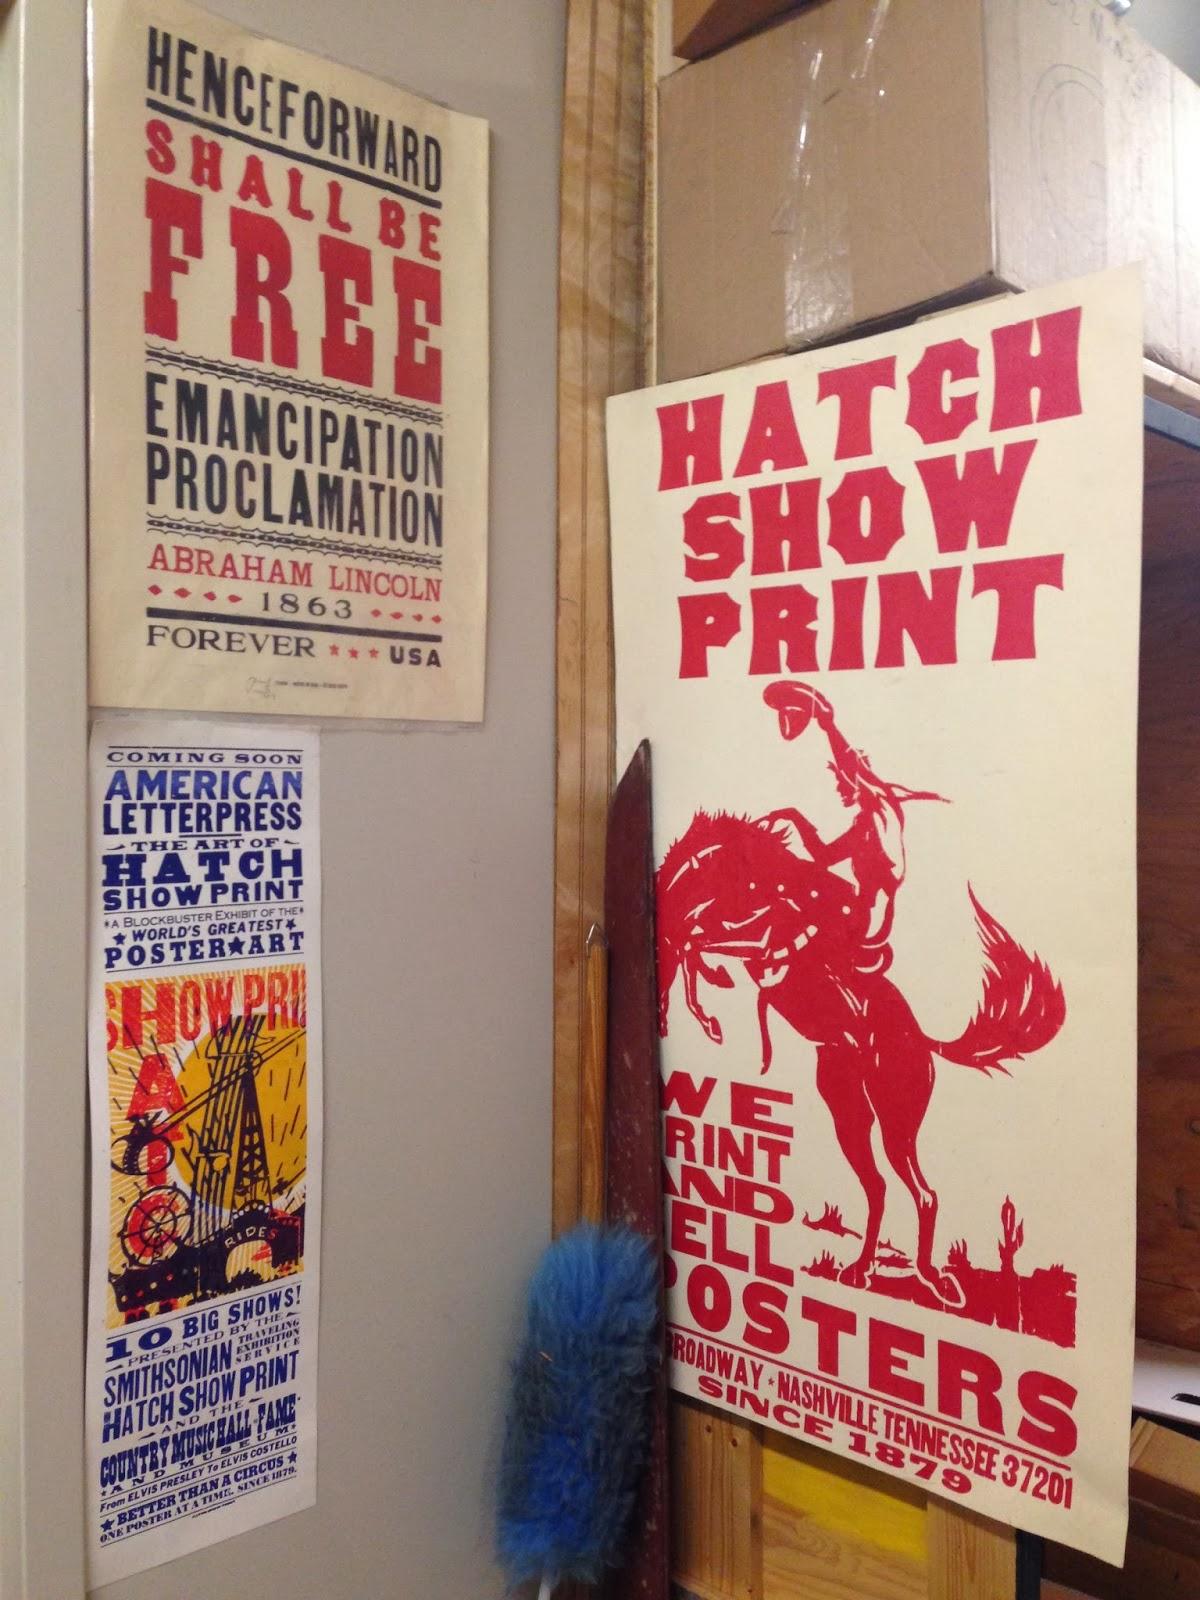 HATCH SHOW PRINT NASHVILLE | RETRO PRESS